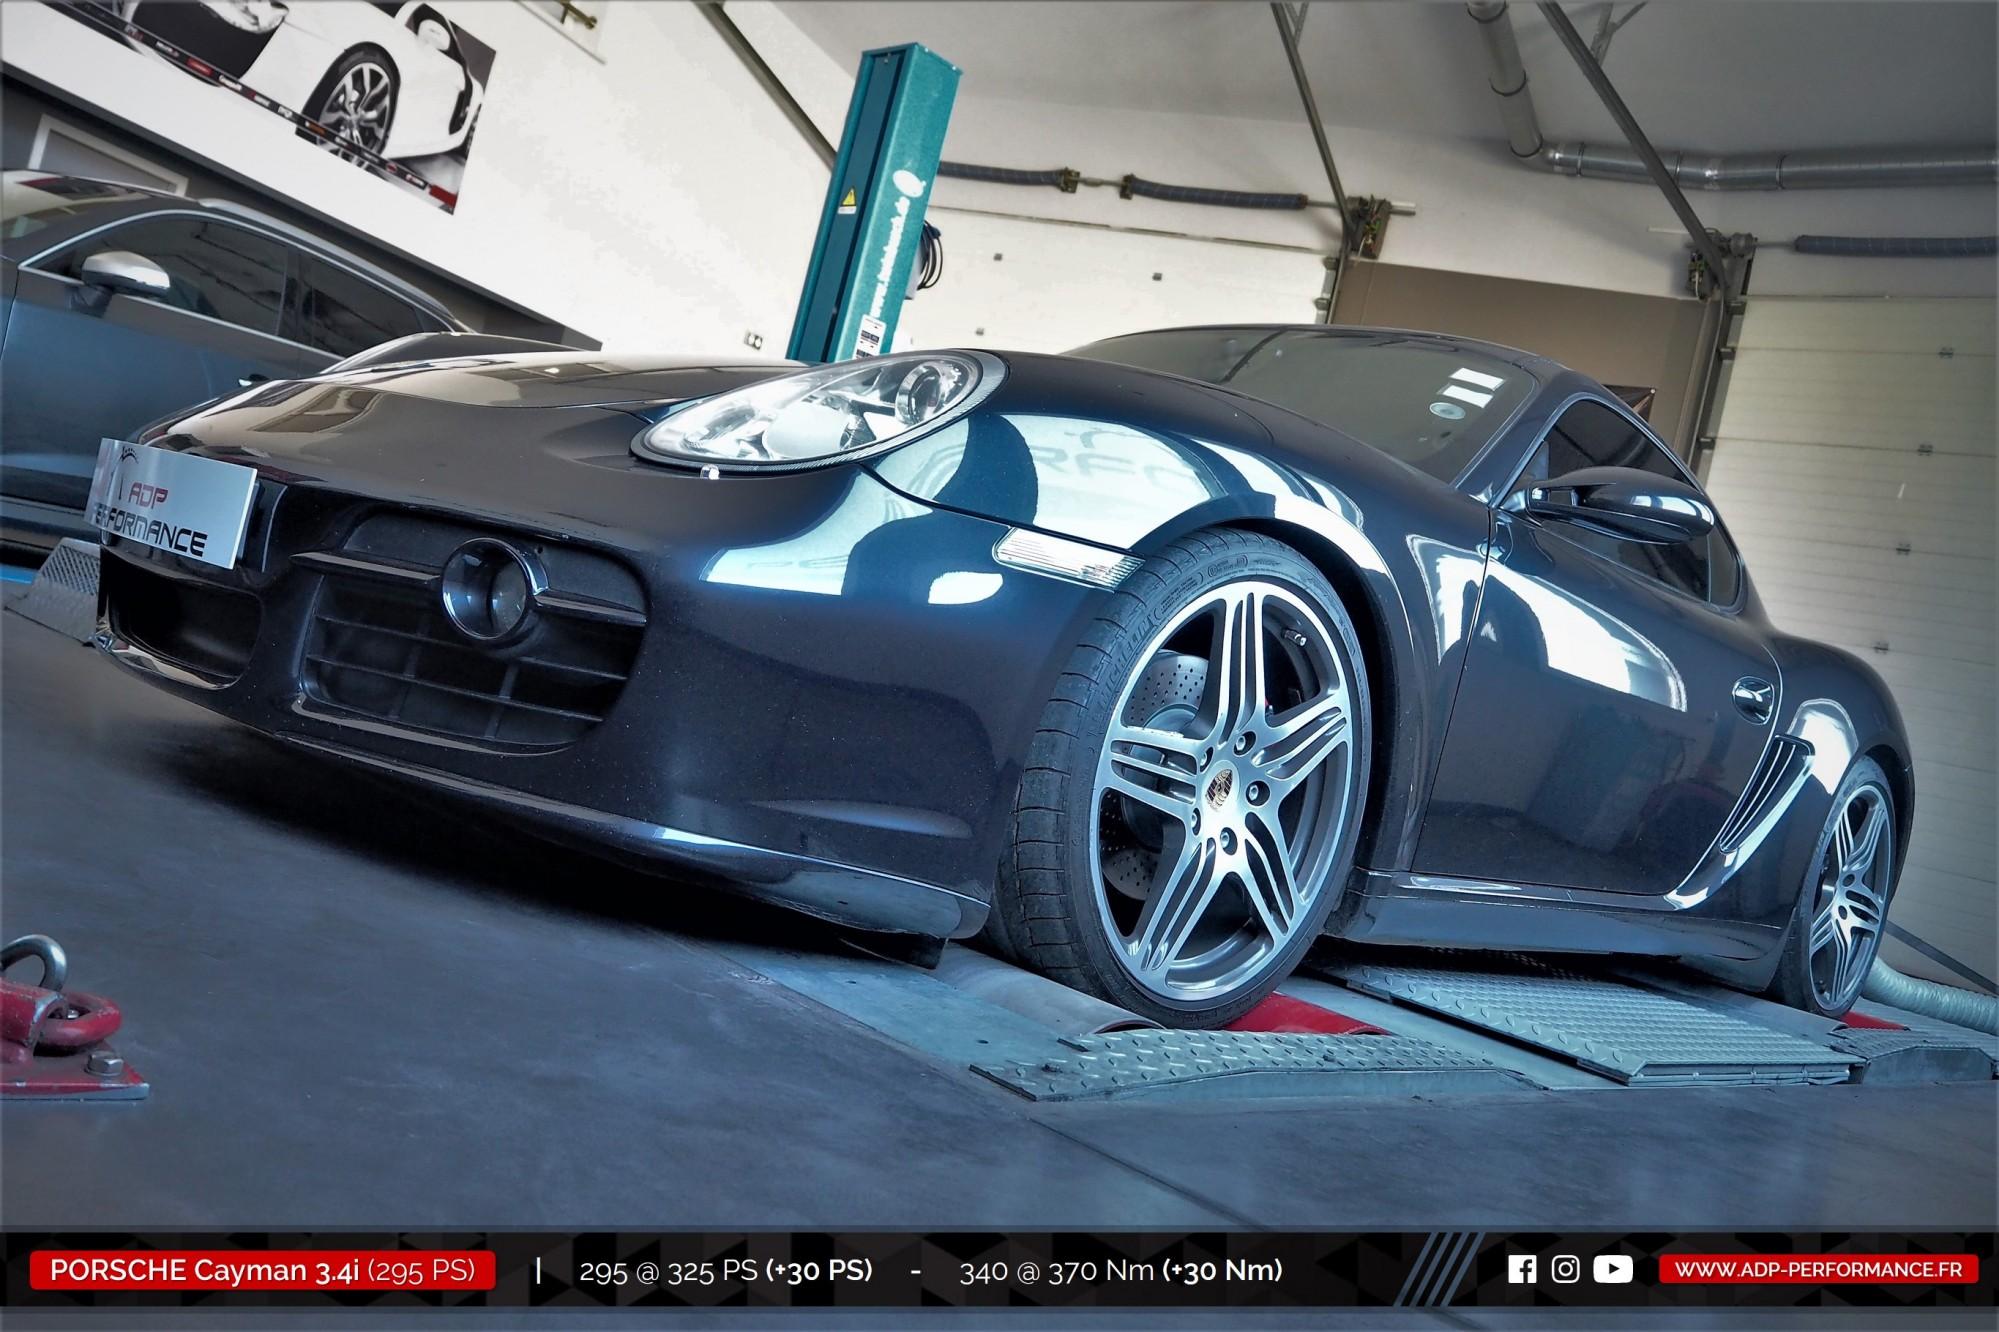 Reprogrammation moteur Salon de Provence - Porsche Cayman S 3.4i 295cv - ADP Performance